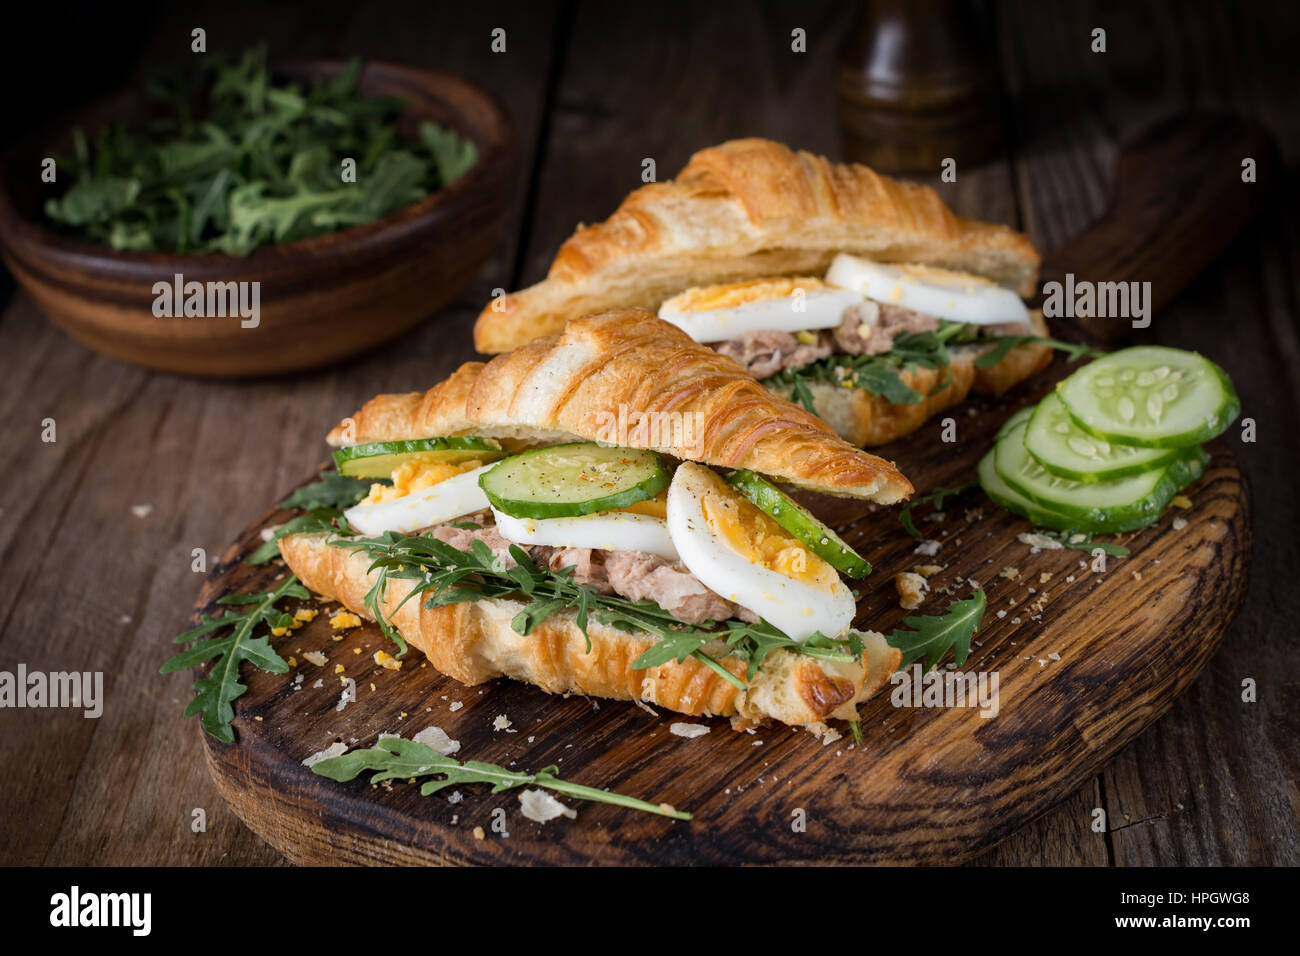 Tuna croissant sandwiches on wooden cutting board. Fresh tasty tuna salad sandwiches. - Stock Image